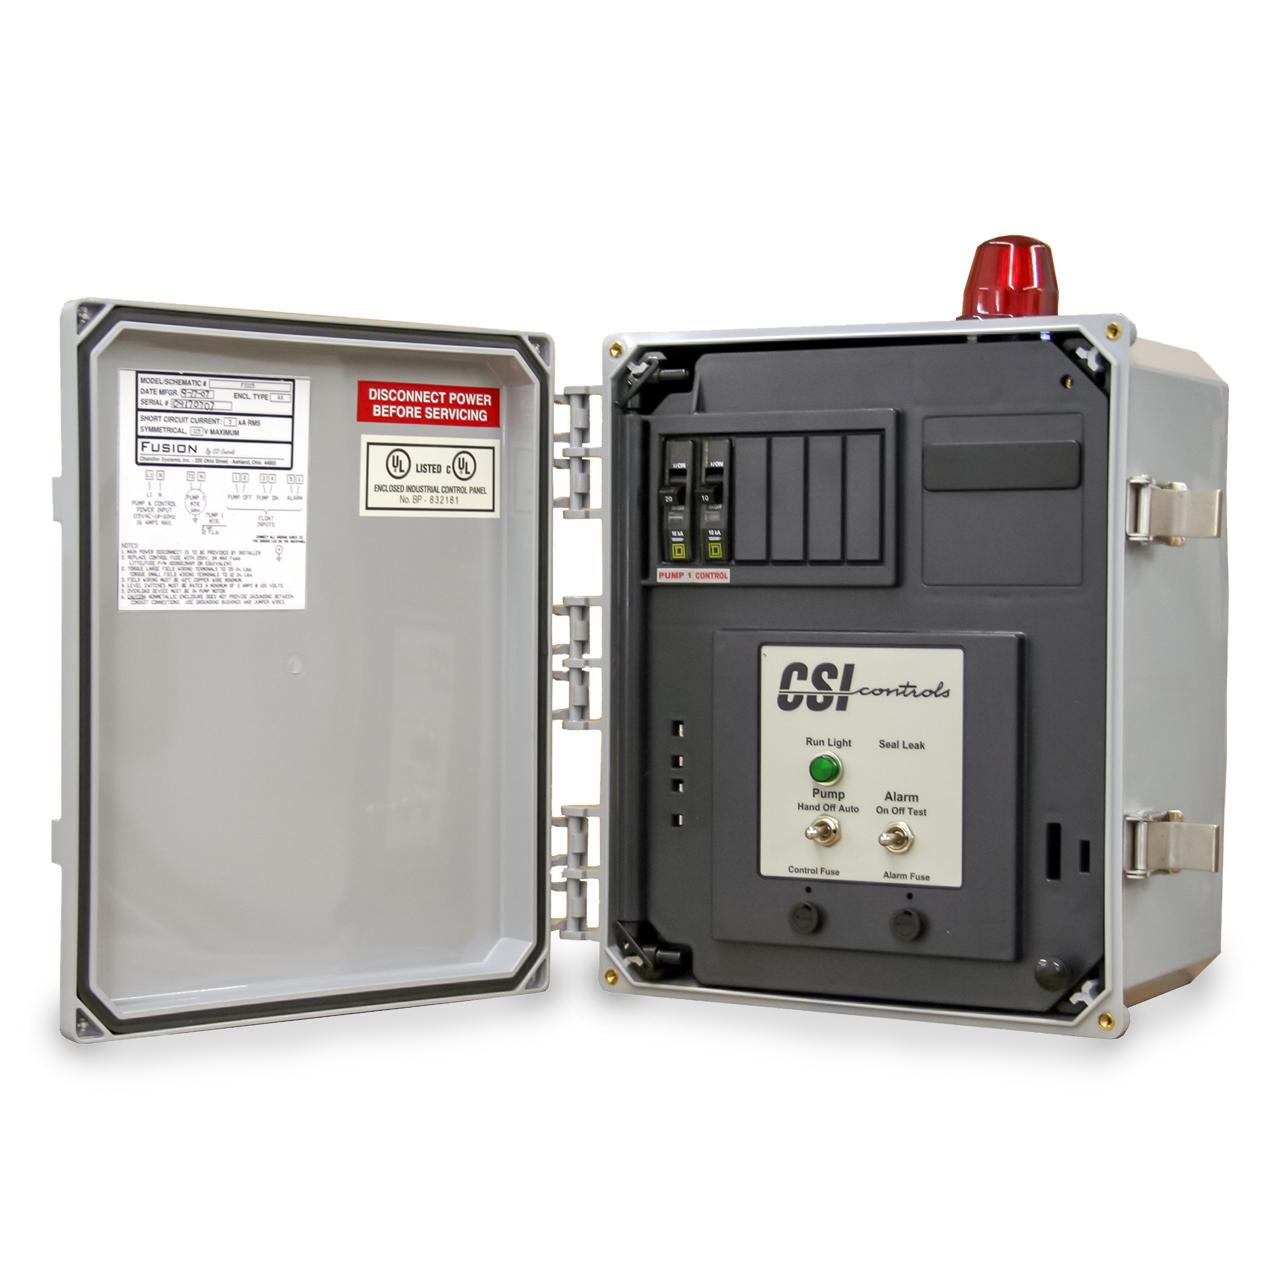 hight resolution of csi controls csi controls fs230cb fusion simplex pump panel 230v 12fla csifs230cb